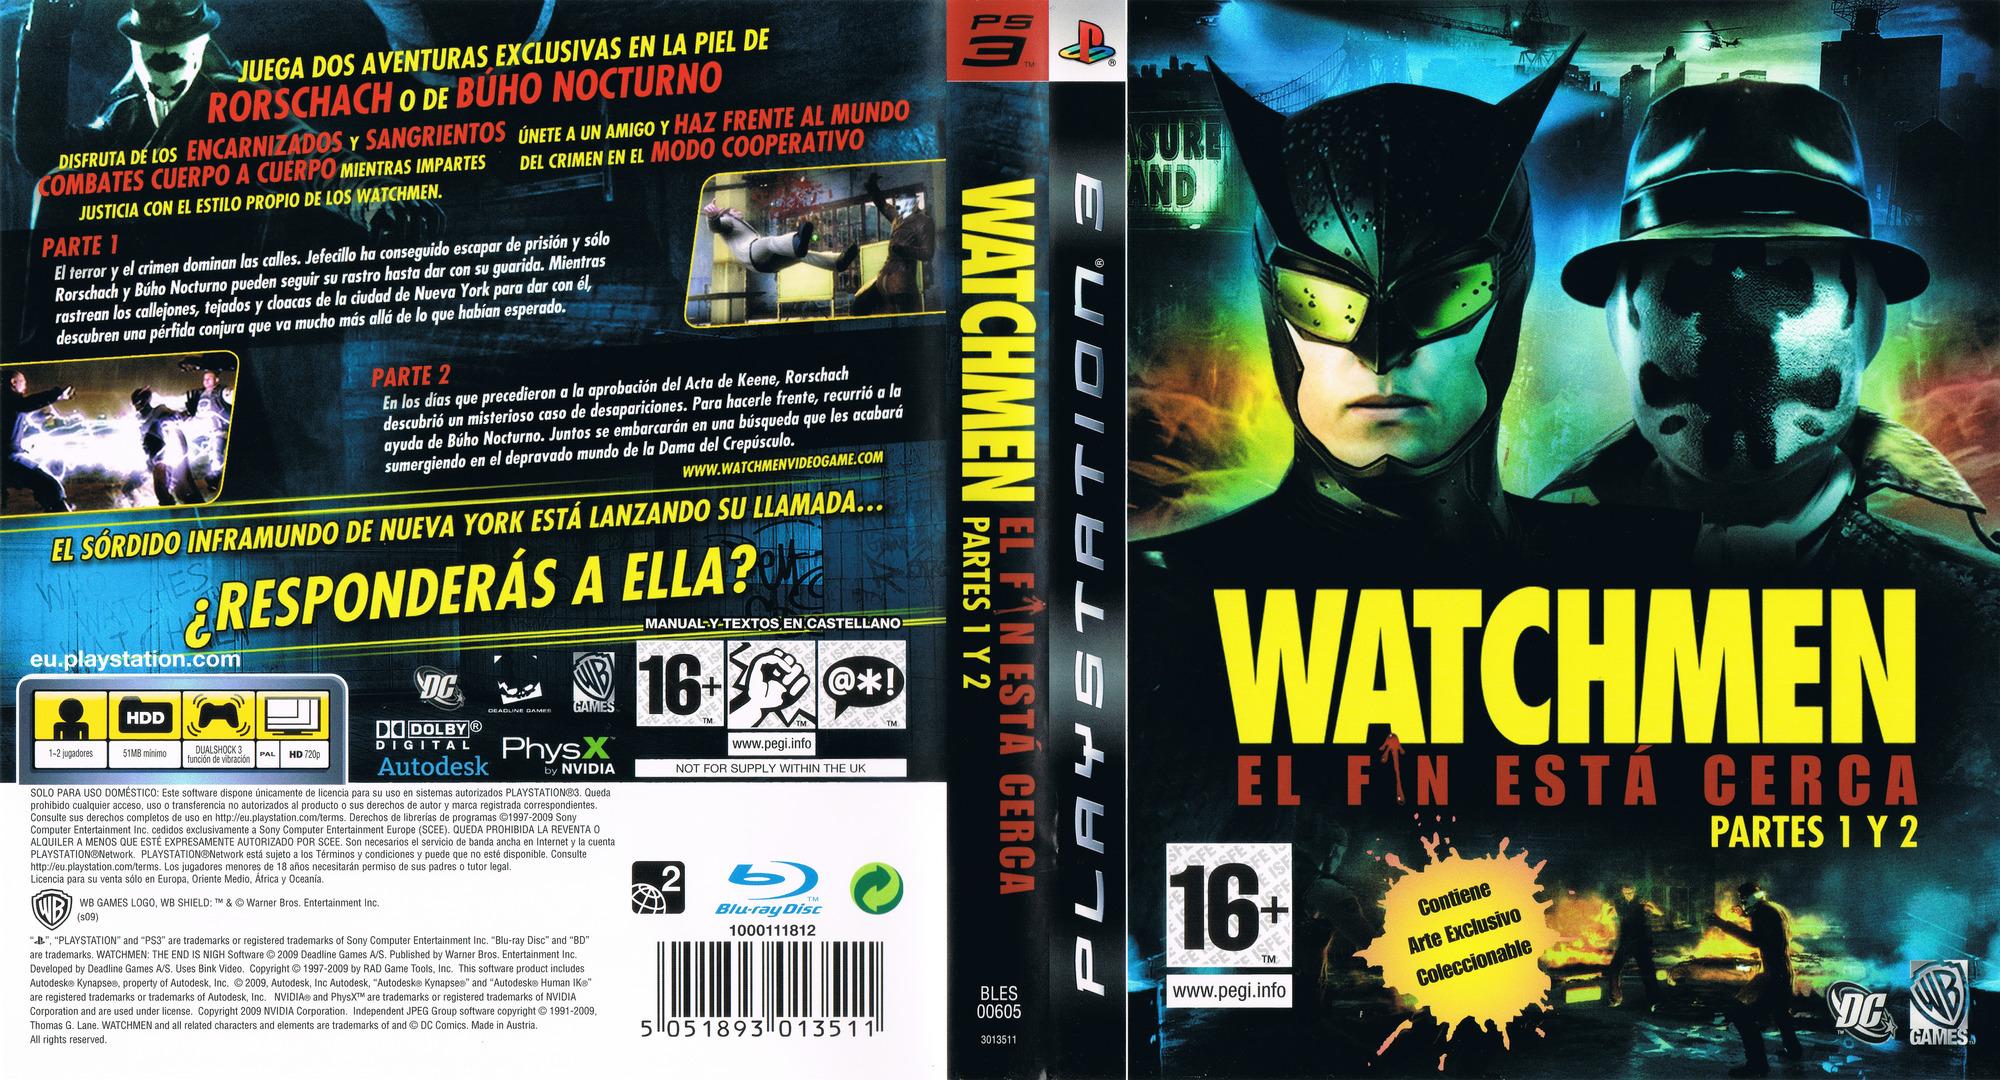 Watchmen: El Fin Está Cerca - Partes 1 y 2 Array coverfullHQ (BLES00605)